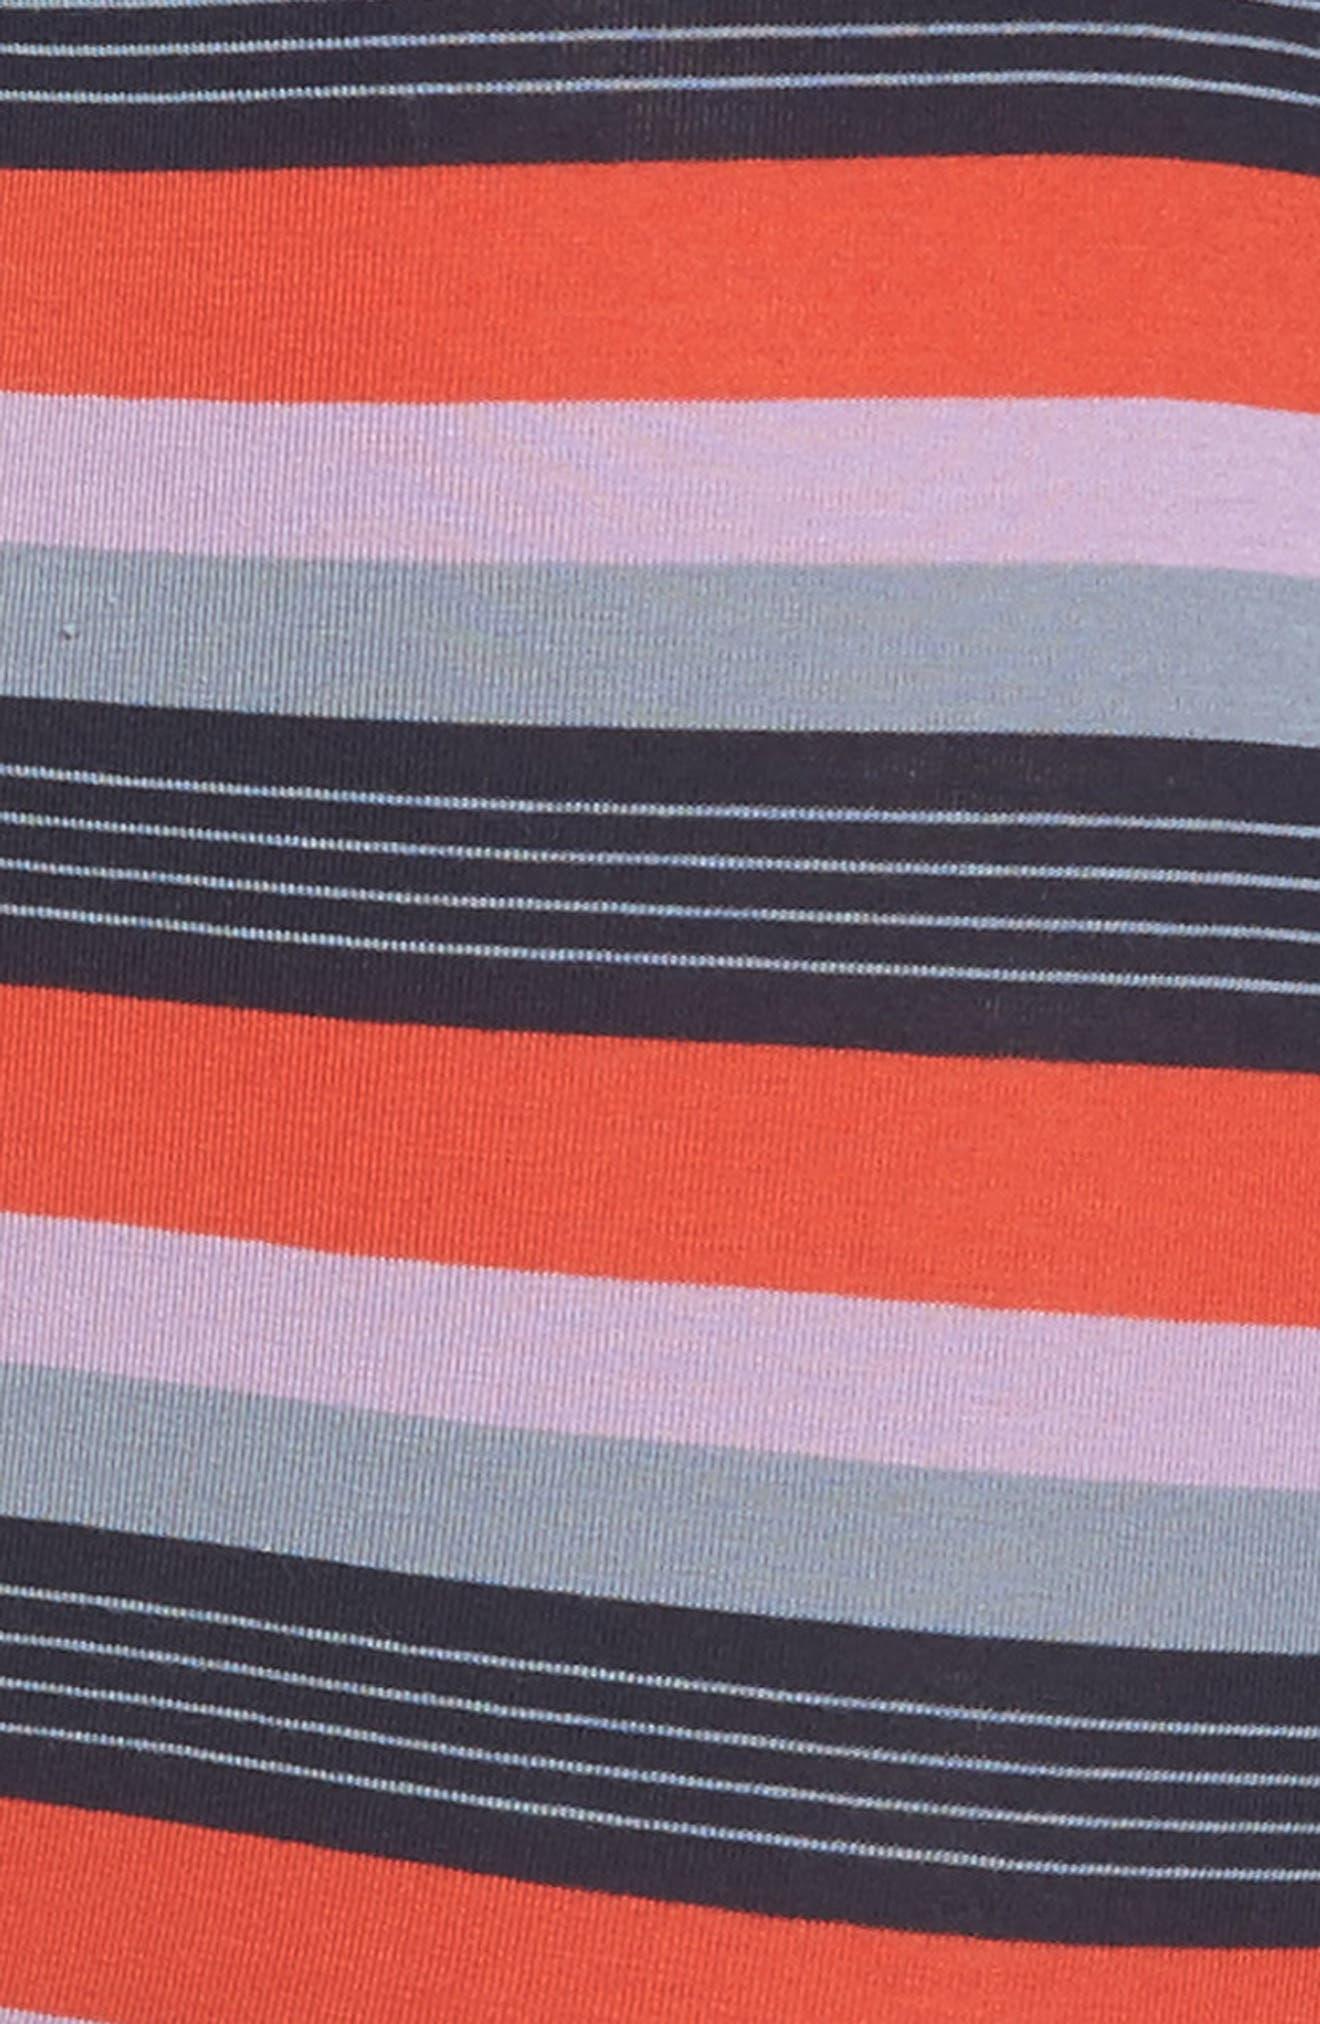 Stripe Stretch Cotton Trunks,                             Alternate thumbnail 4, color,                             Orange Multi